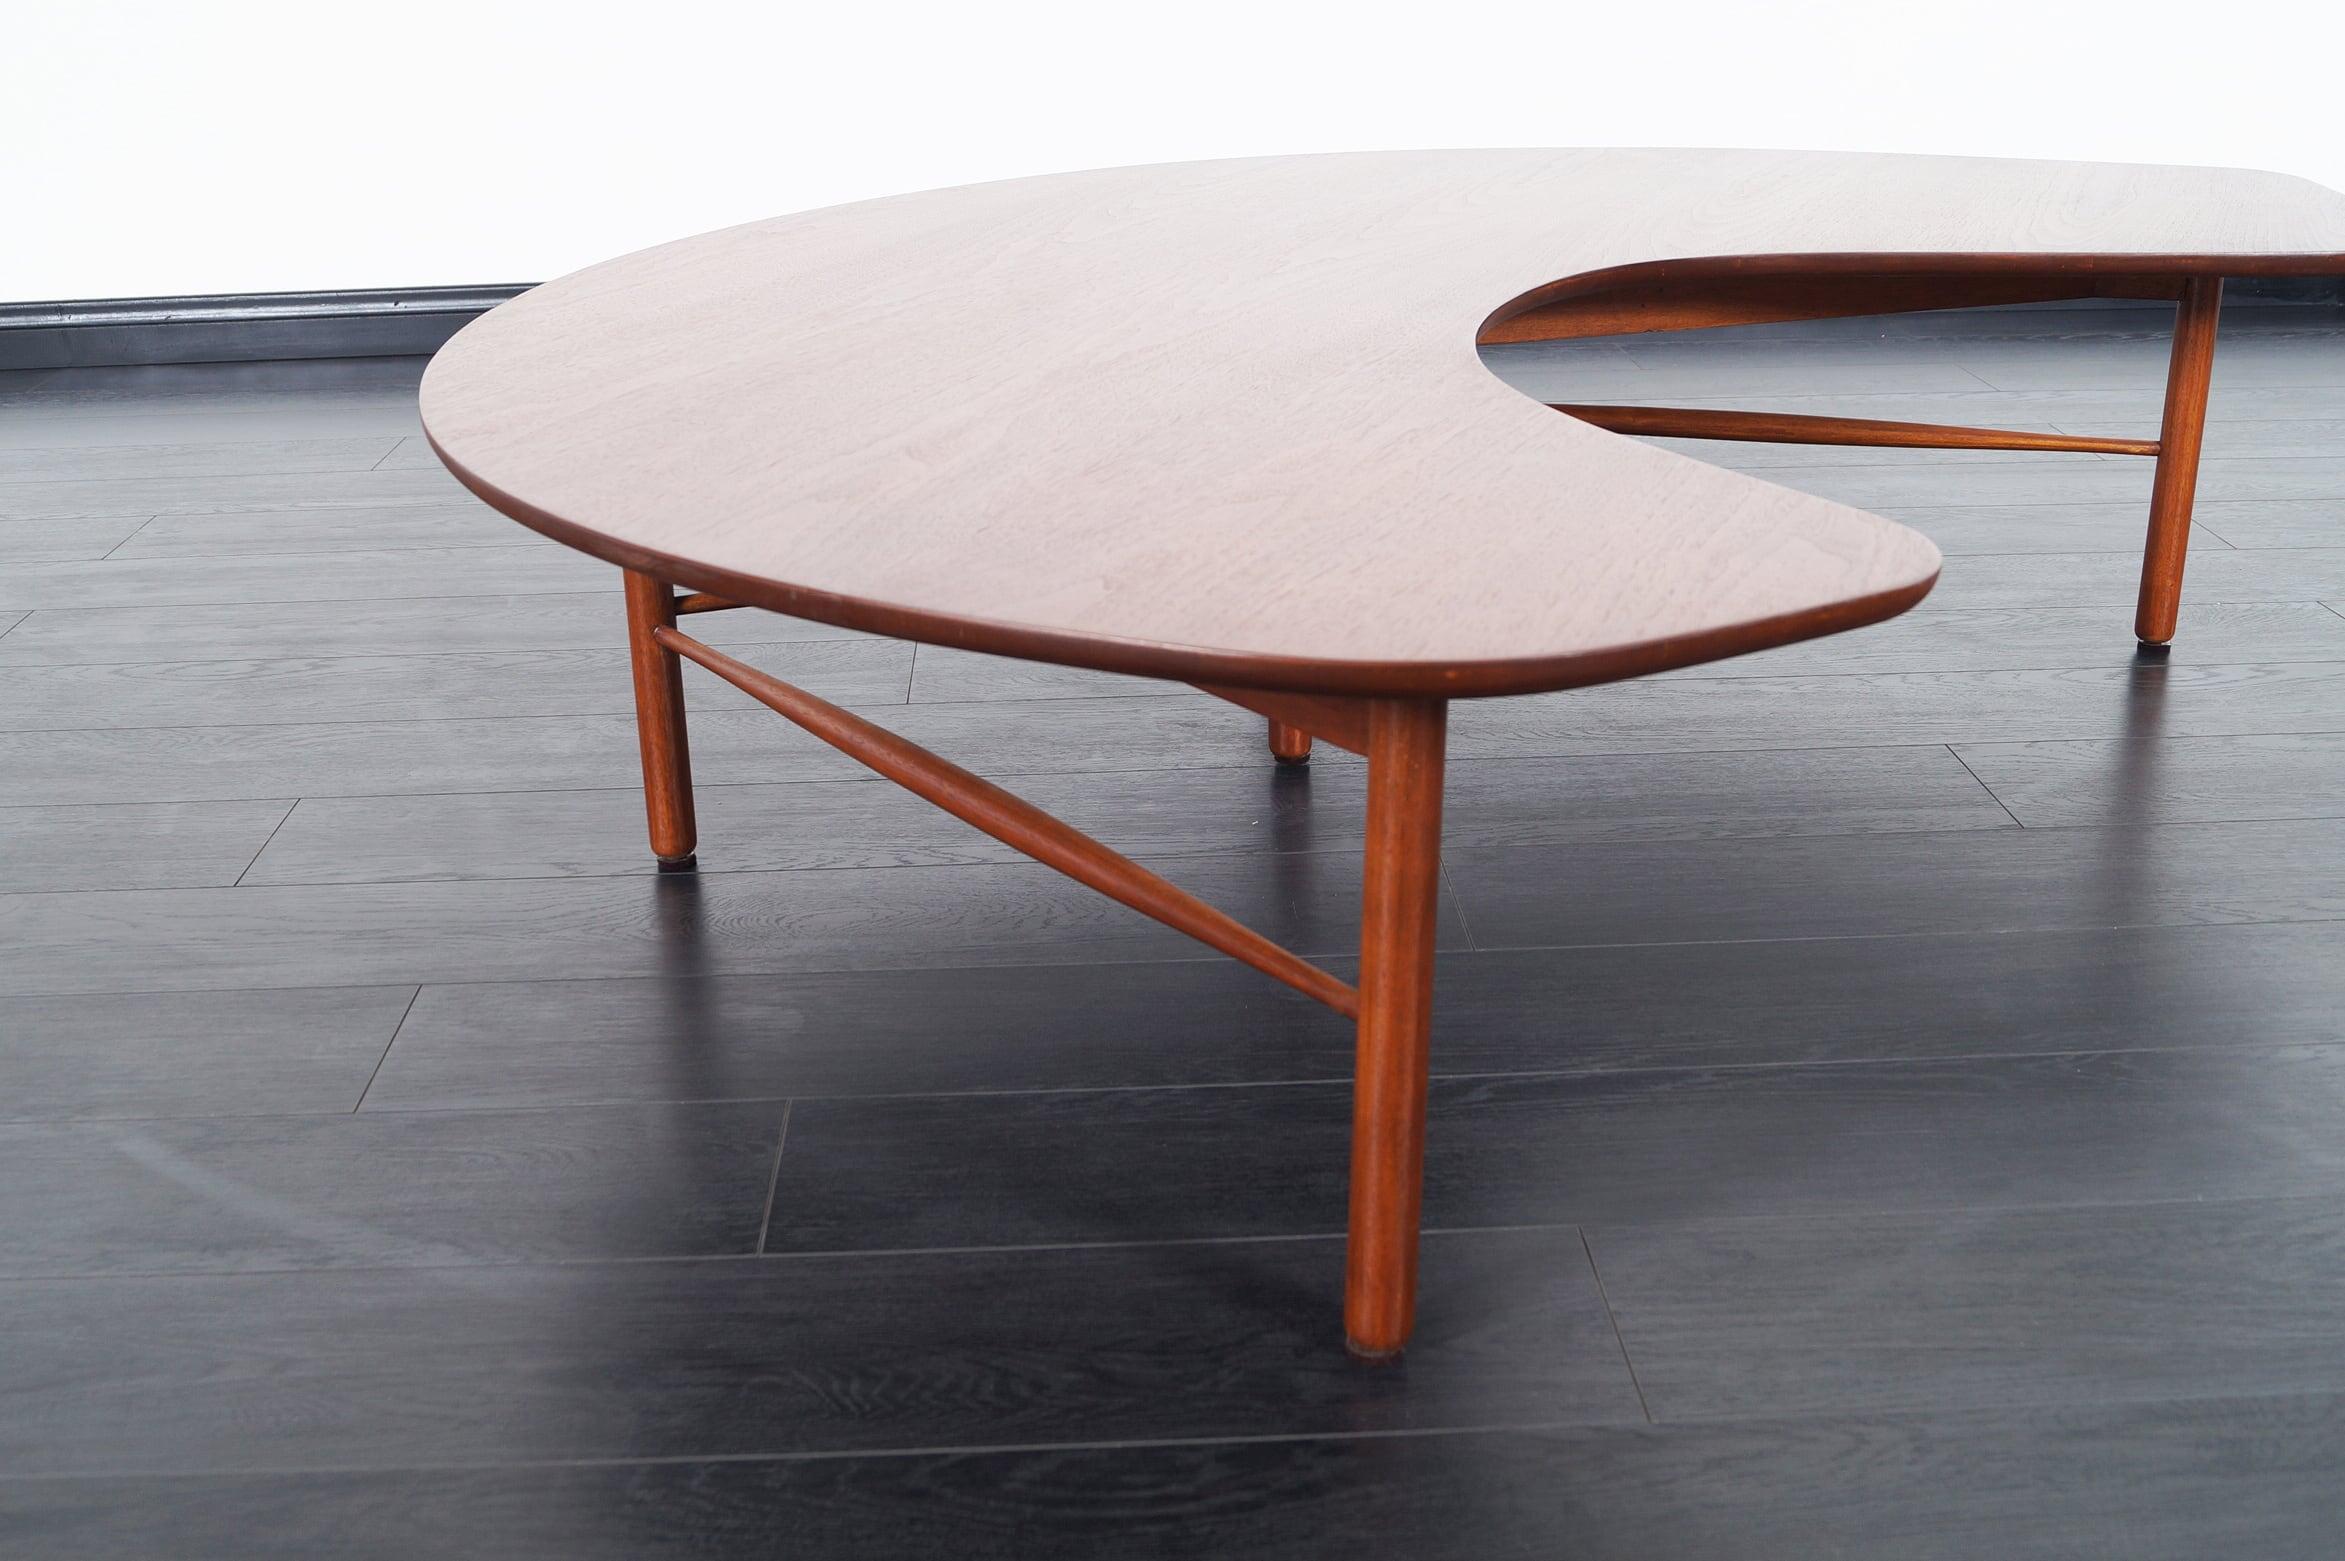 Vintage Crescent Moon Coffee Table by Greta M. Grossman